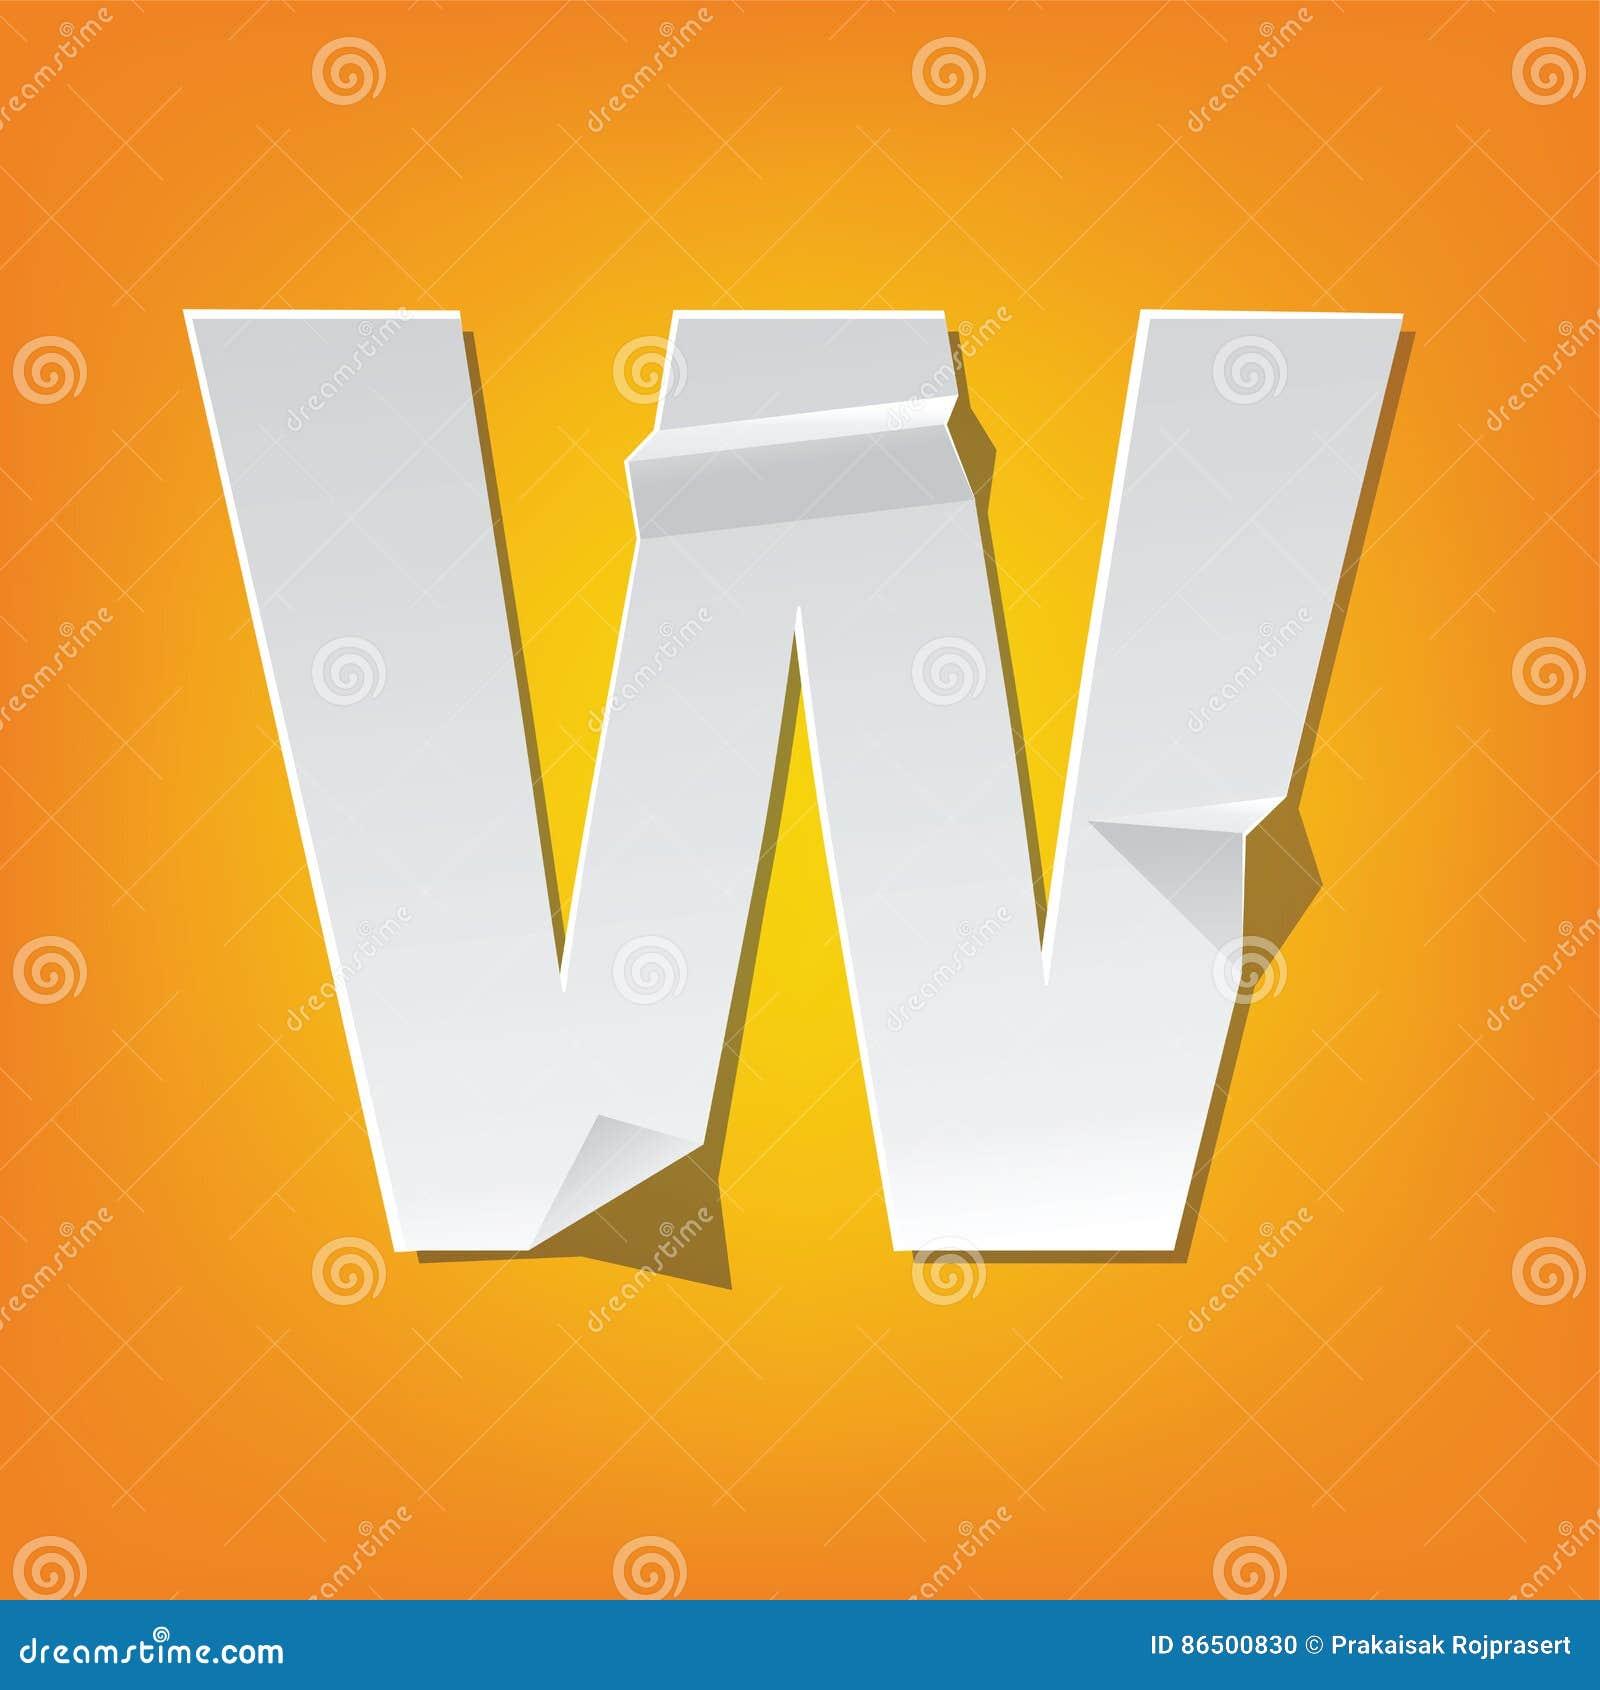 W Capital Letter Fold English Alphabet New Design Stock